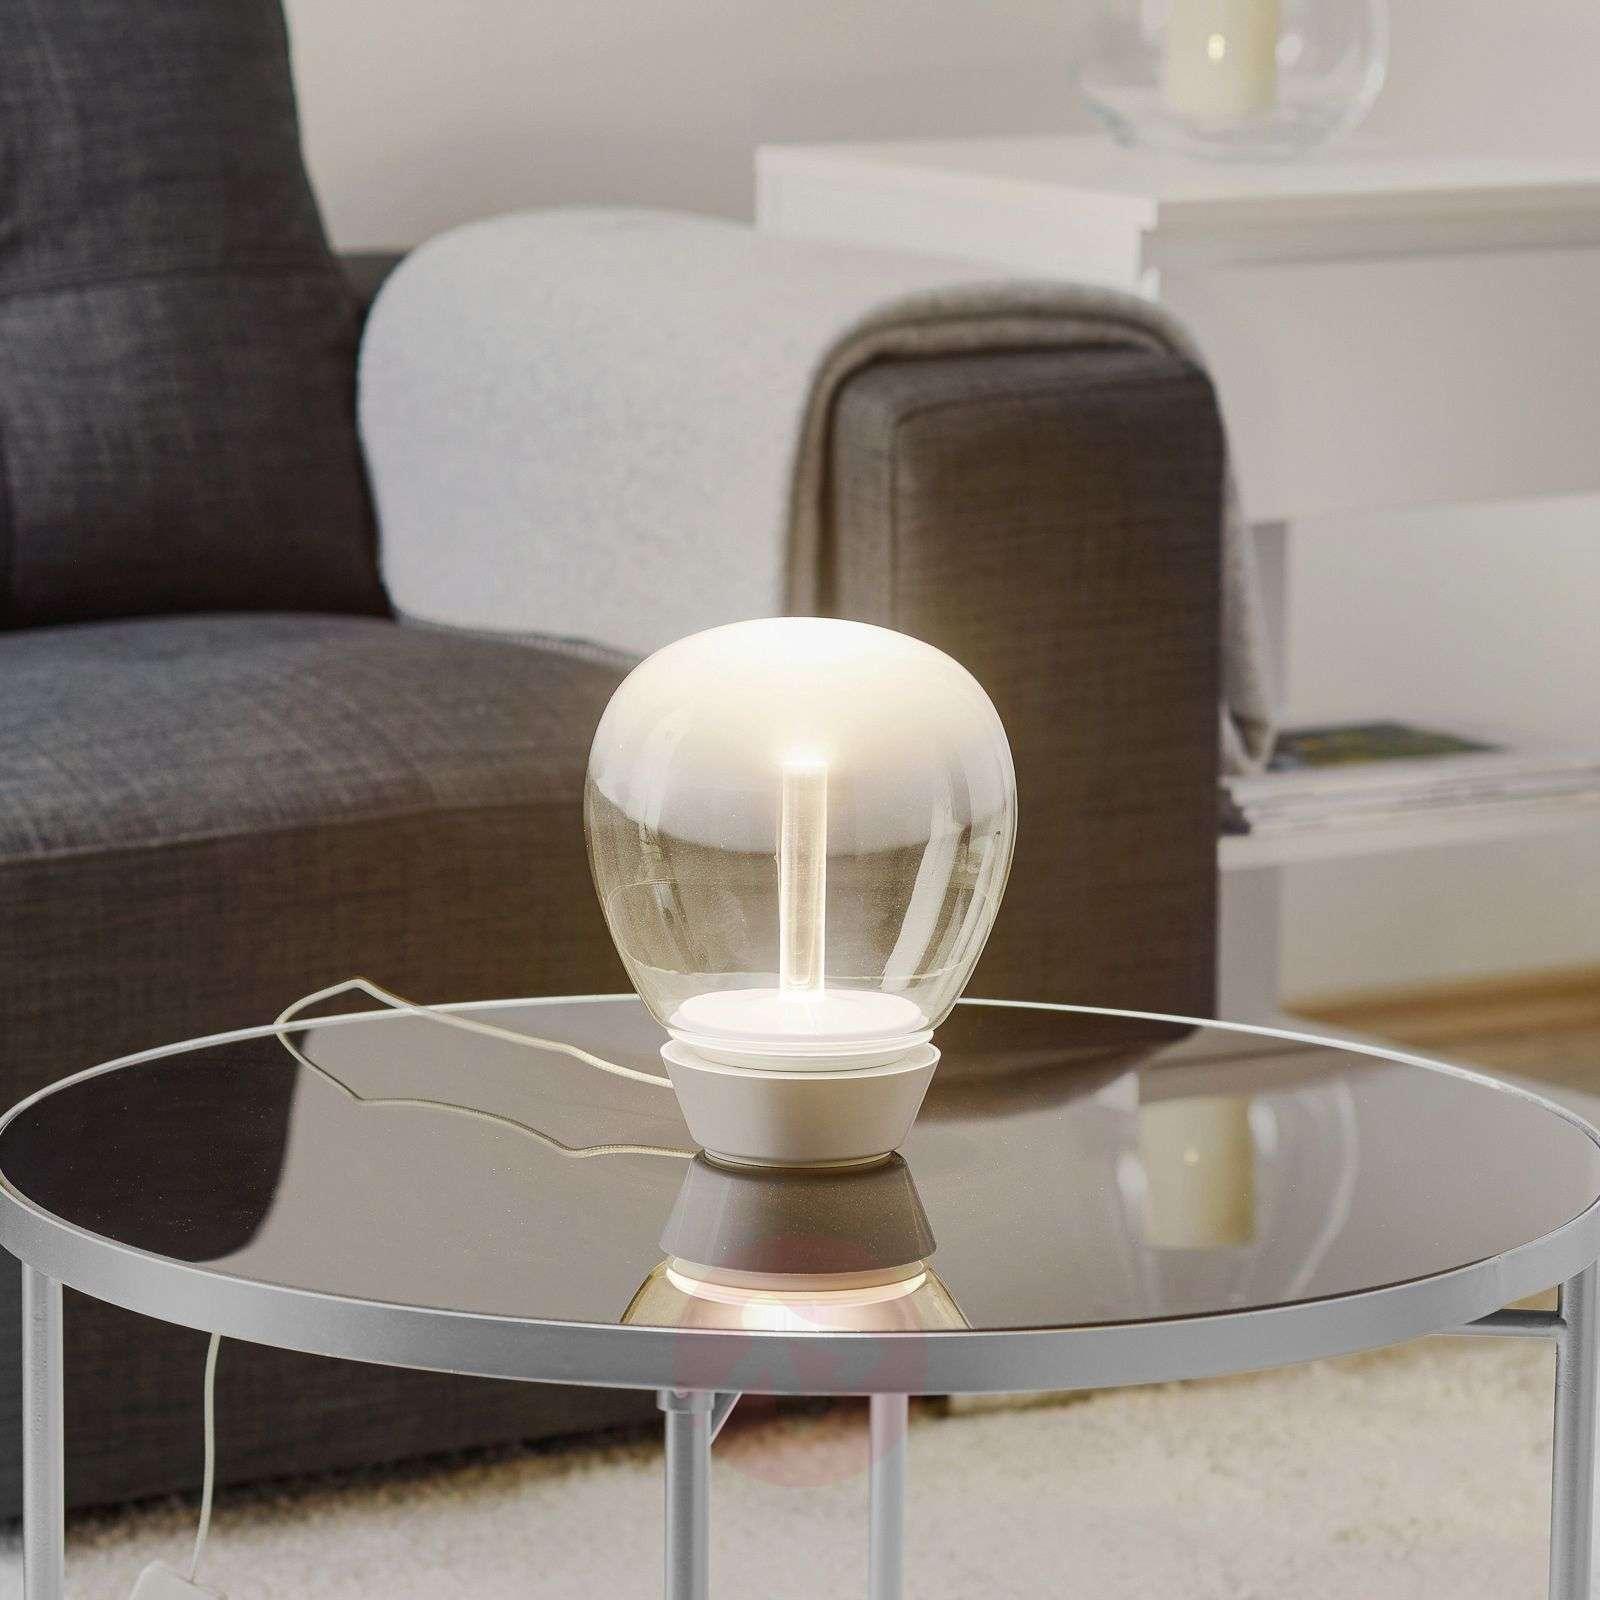 Design-LED-pöytävalaisin Empatia, 16 cm-1060040-01